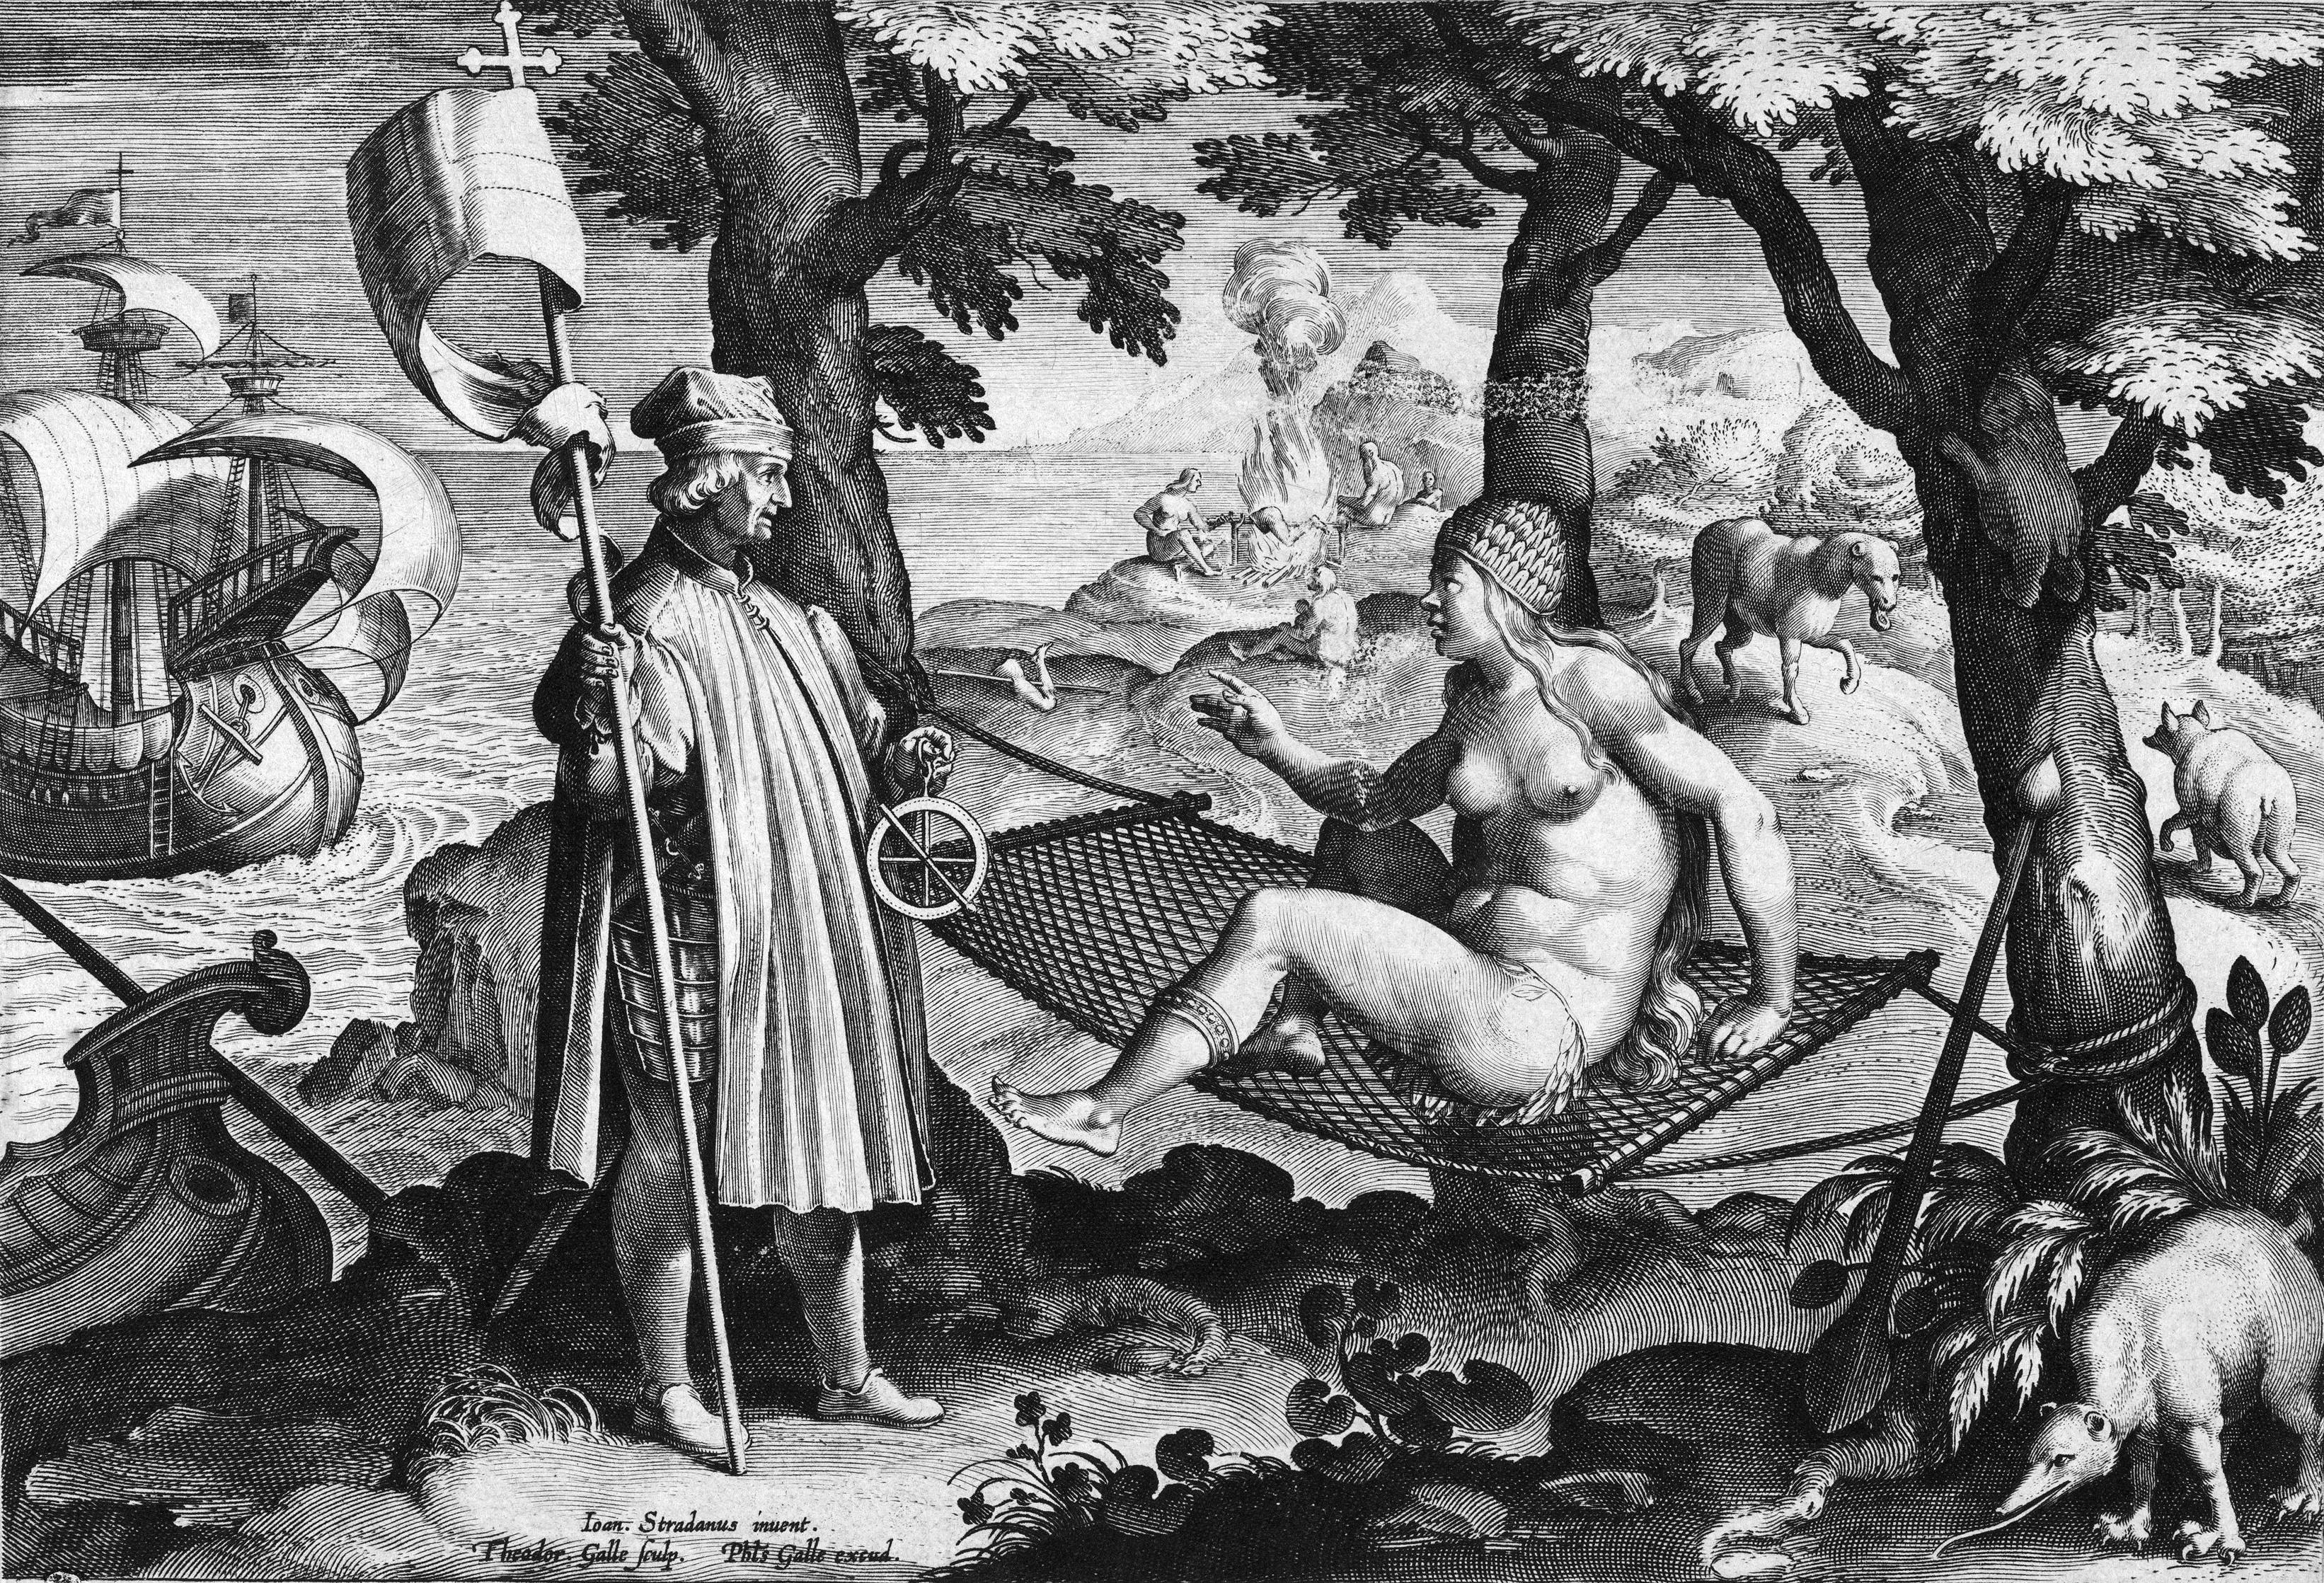 Allegory of the New World: Amerigo Vespucci awakens the sleeping America